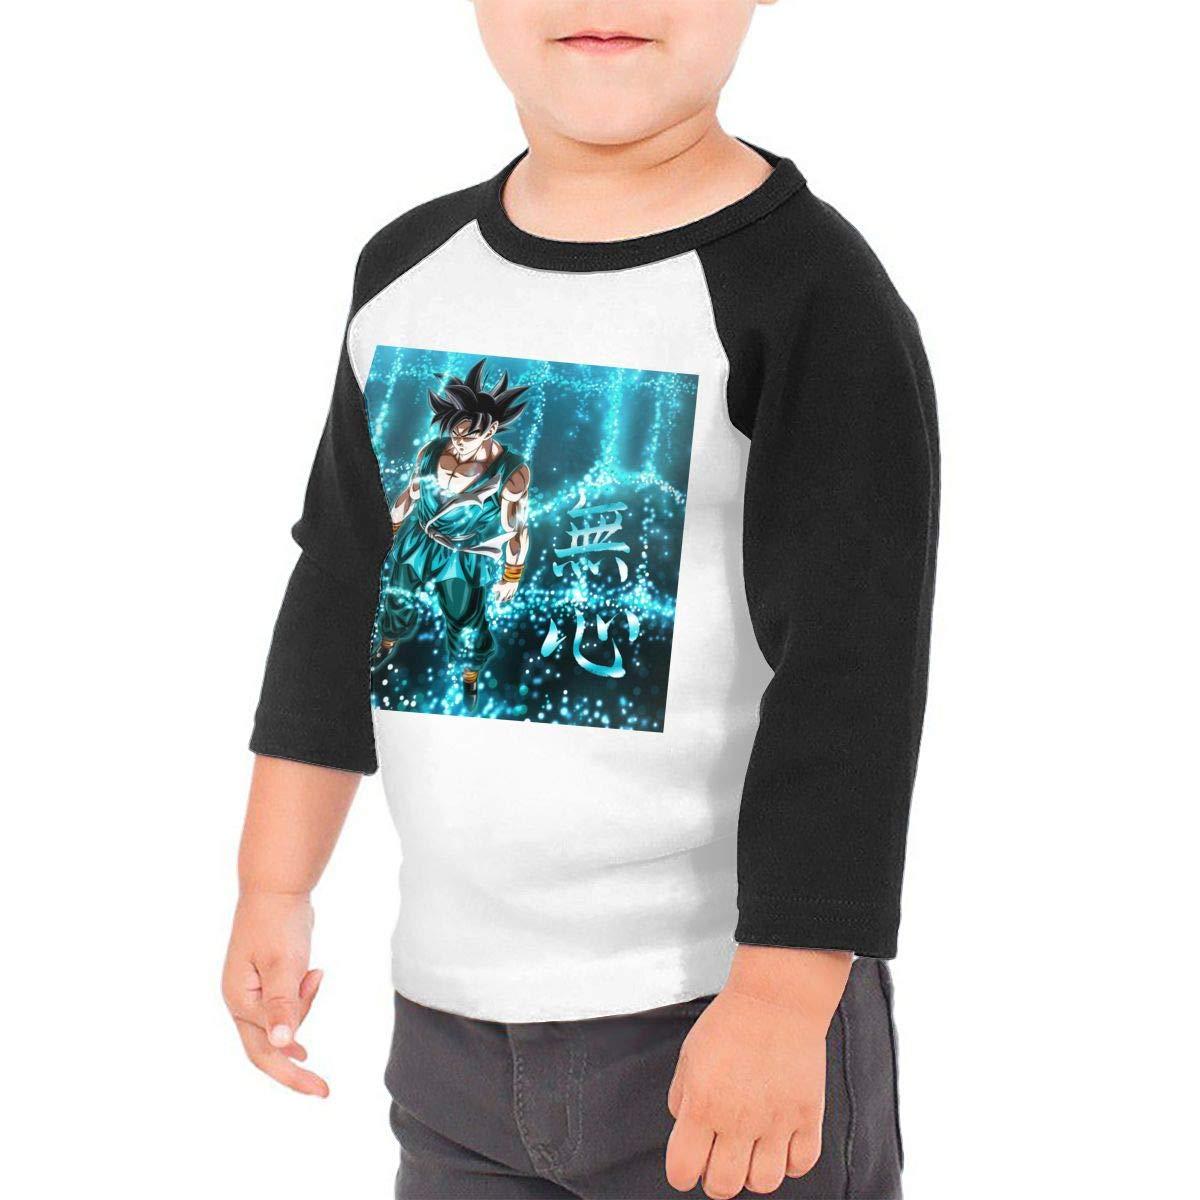 Dragon Ball Super Ultra Instinct Children S Middle Sleeve T Shirt Anime Cool Tee 3692